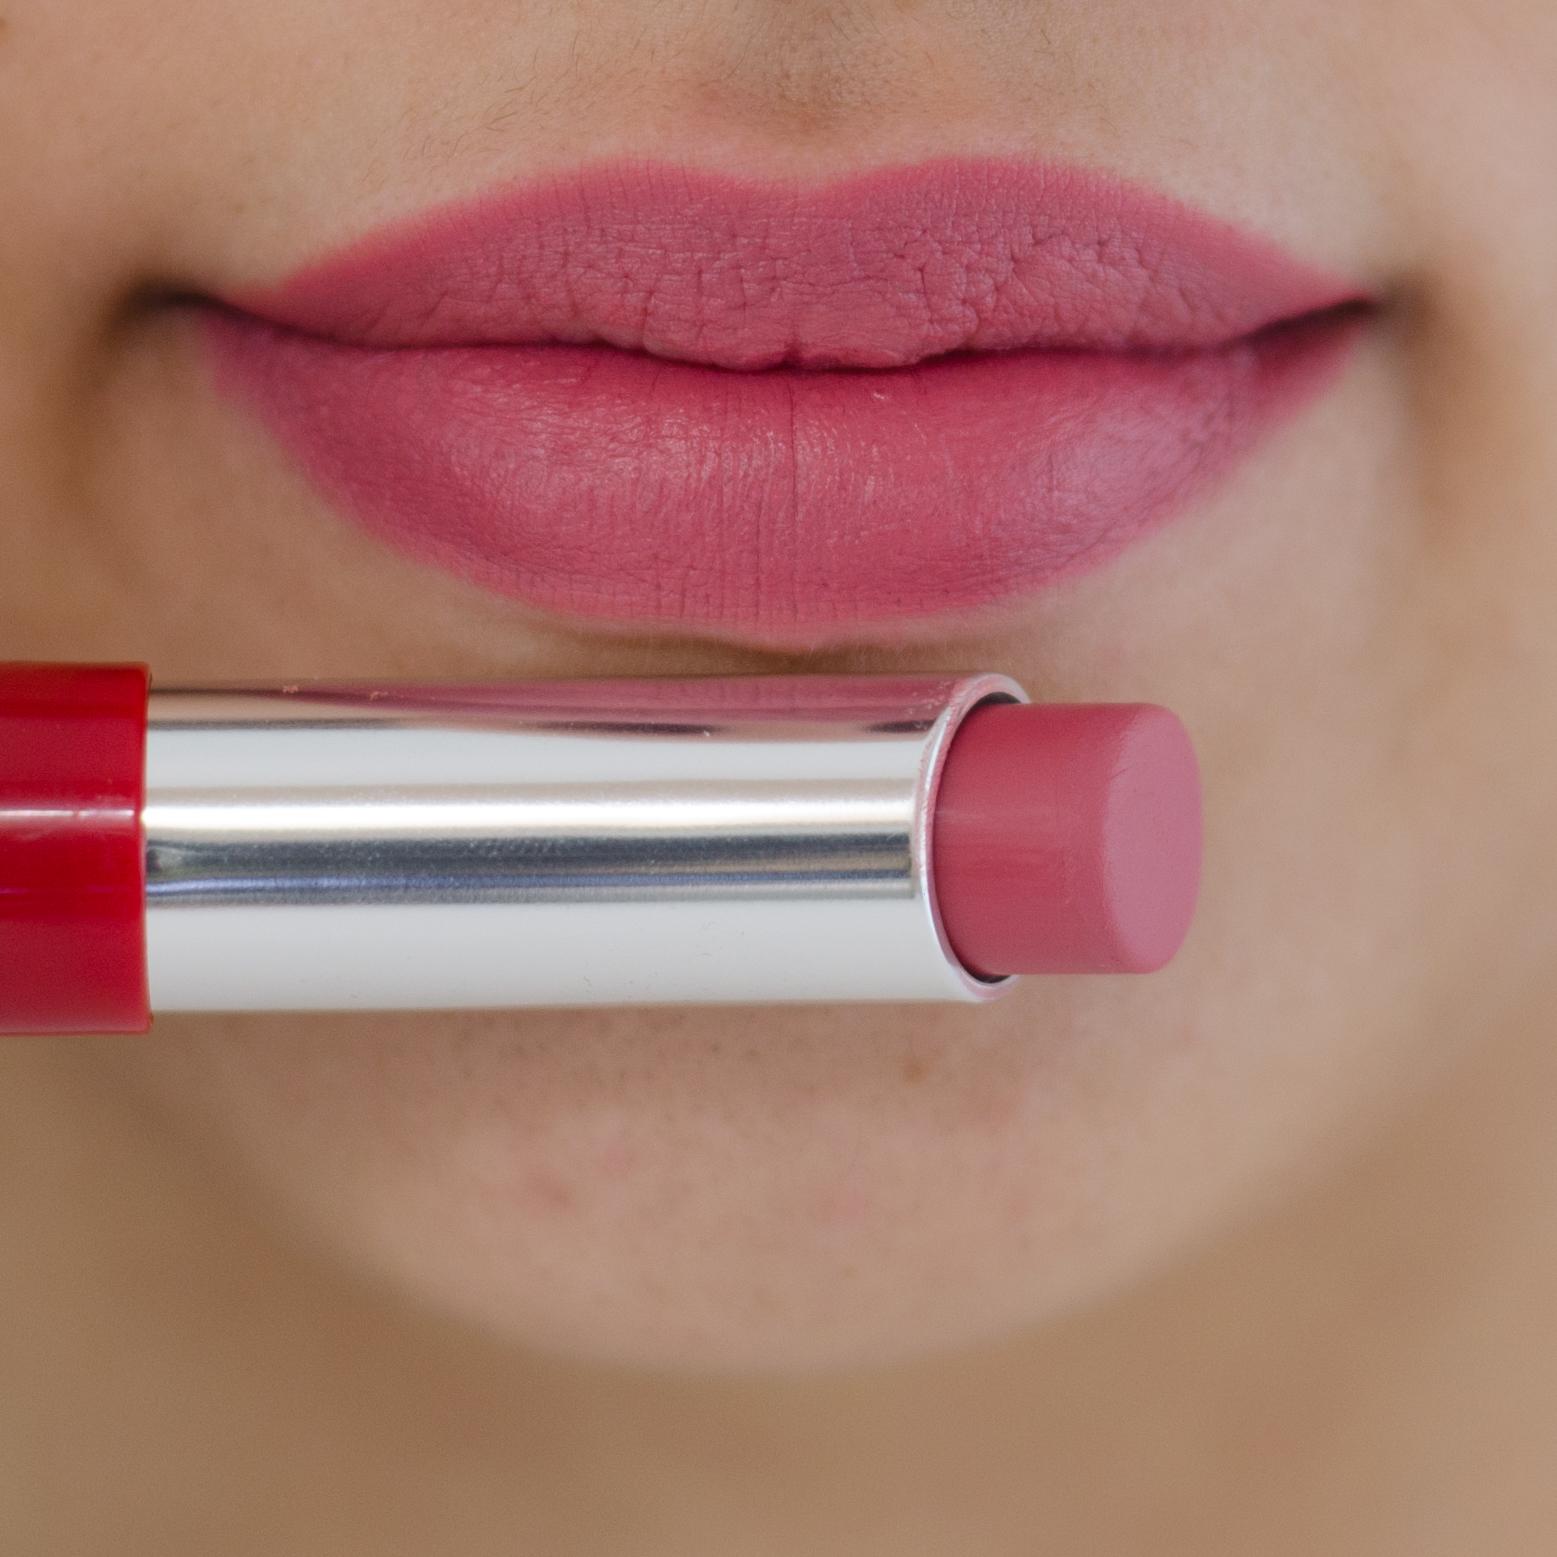 rimmel london only 1 matte lipstick review